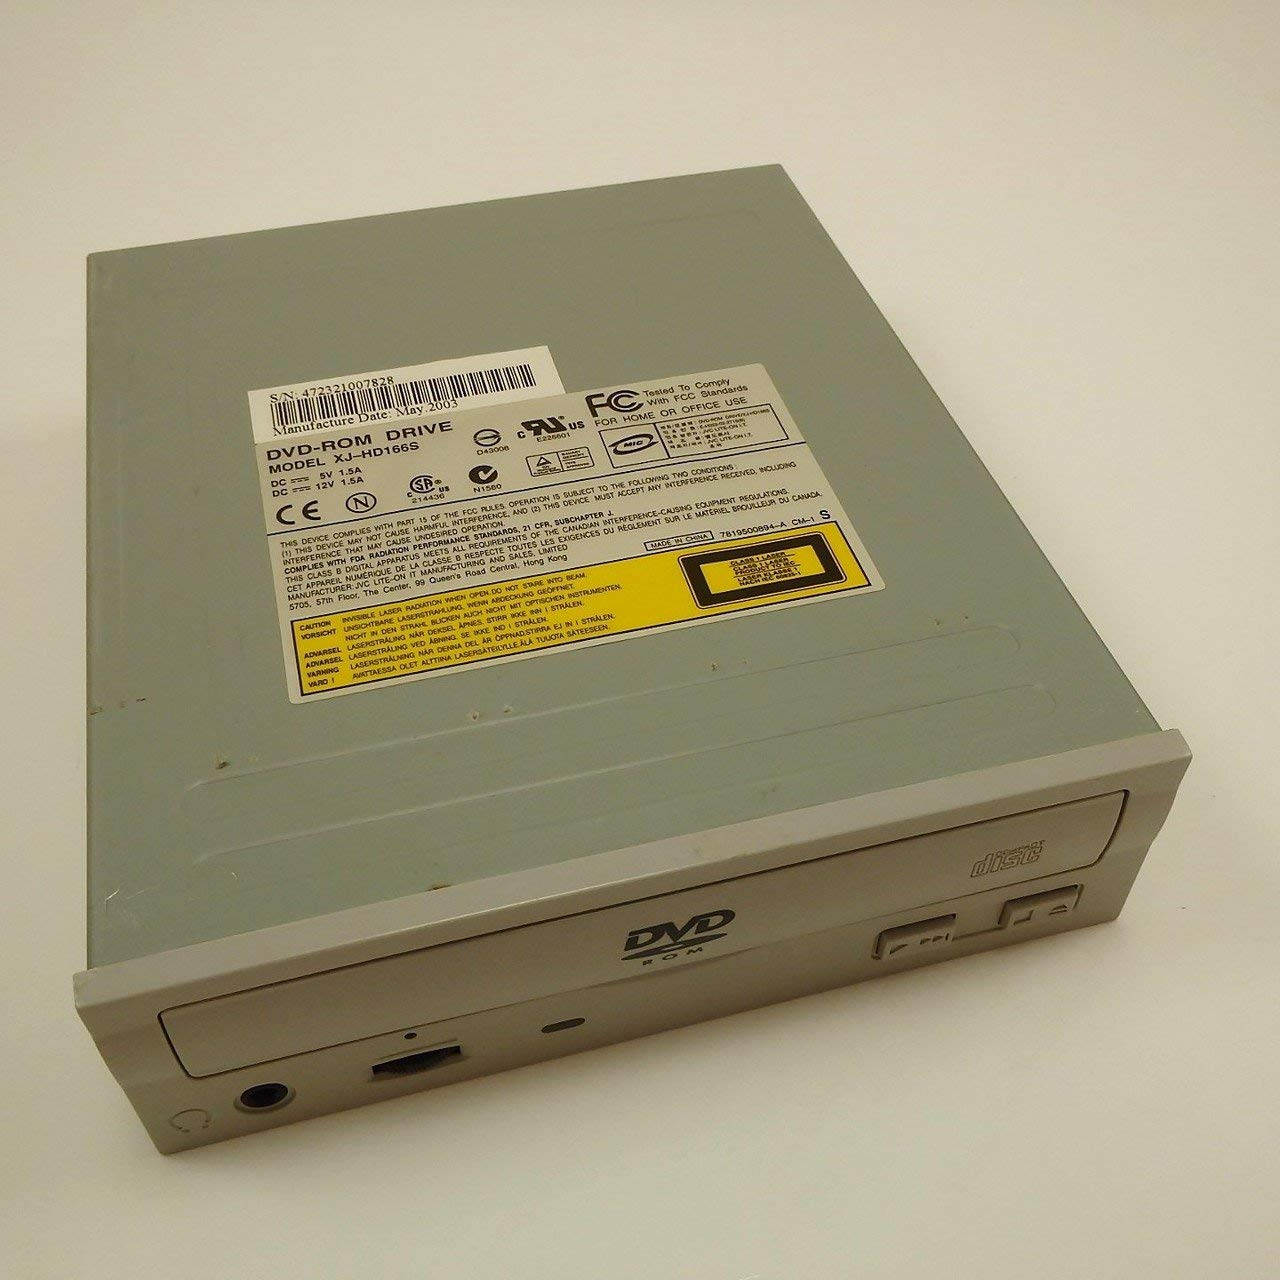 LITE-ON DVD-ROM DRIVE XJ-HD166S, DECEMBER 2003